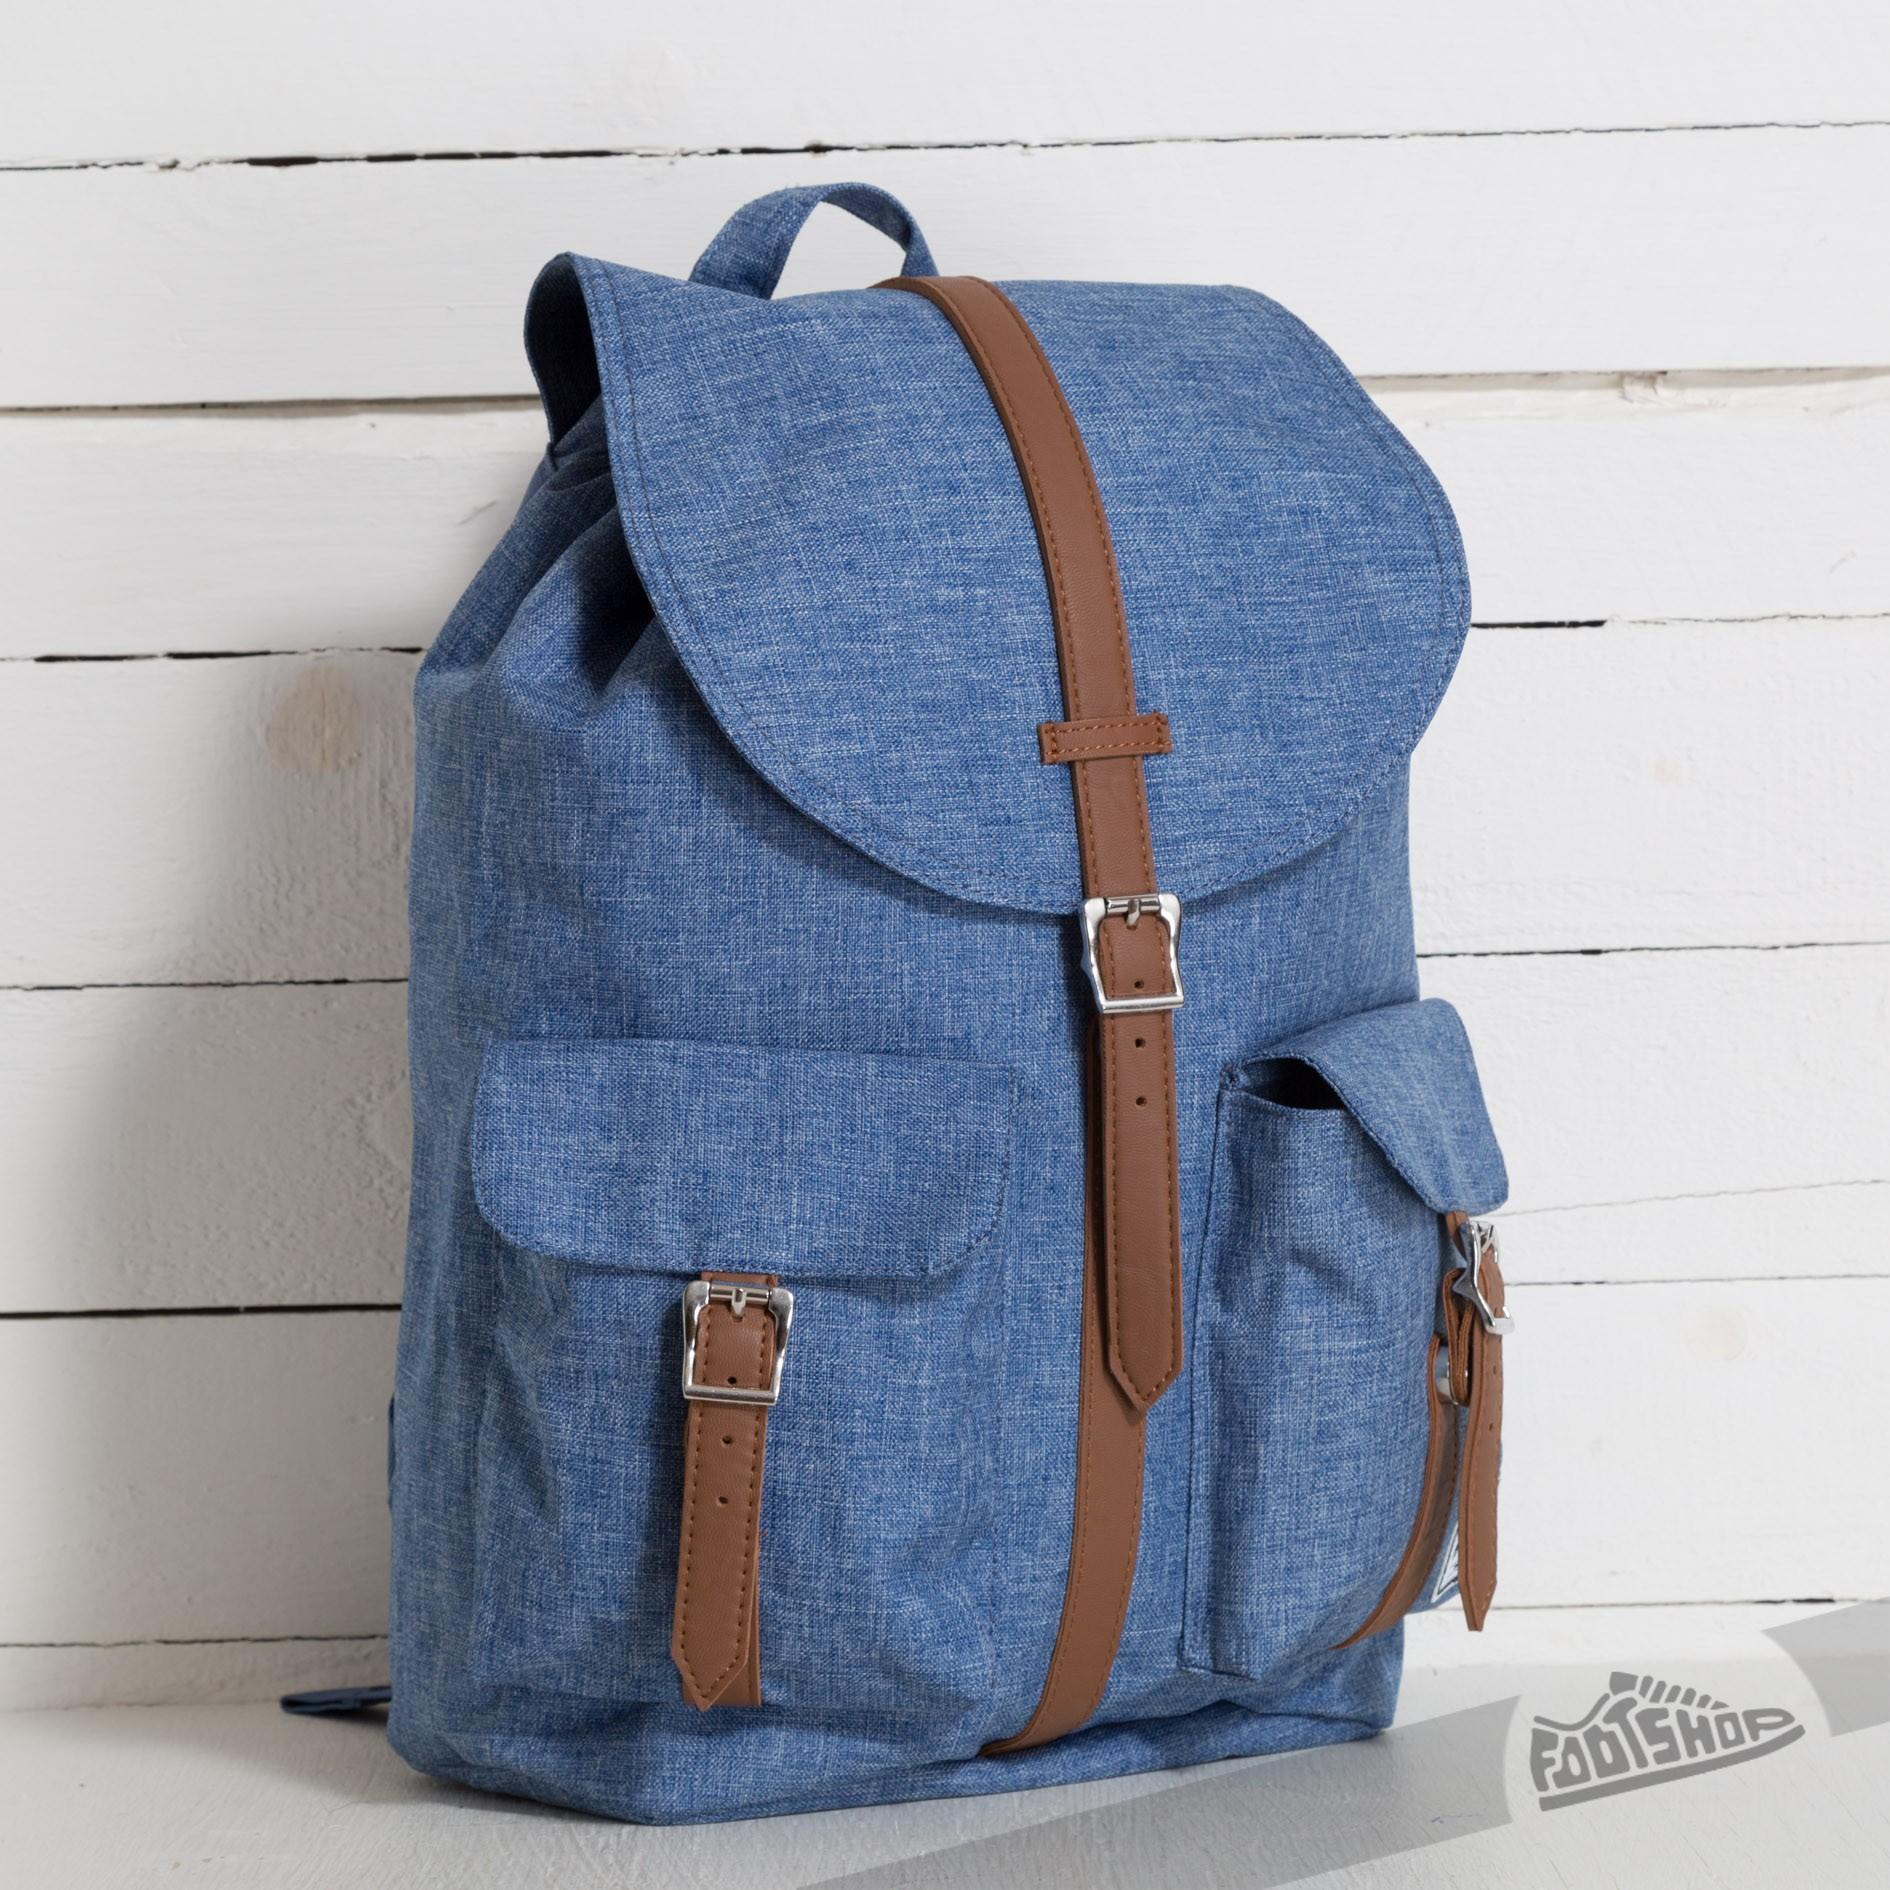 8ed8091794b Herschel Supply Co. Dawson Backpack Limoges Crosshatch